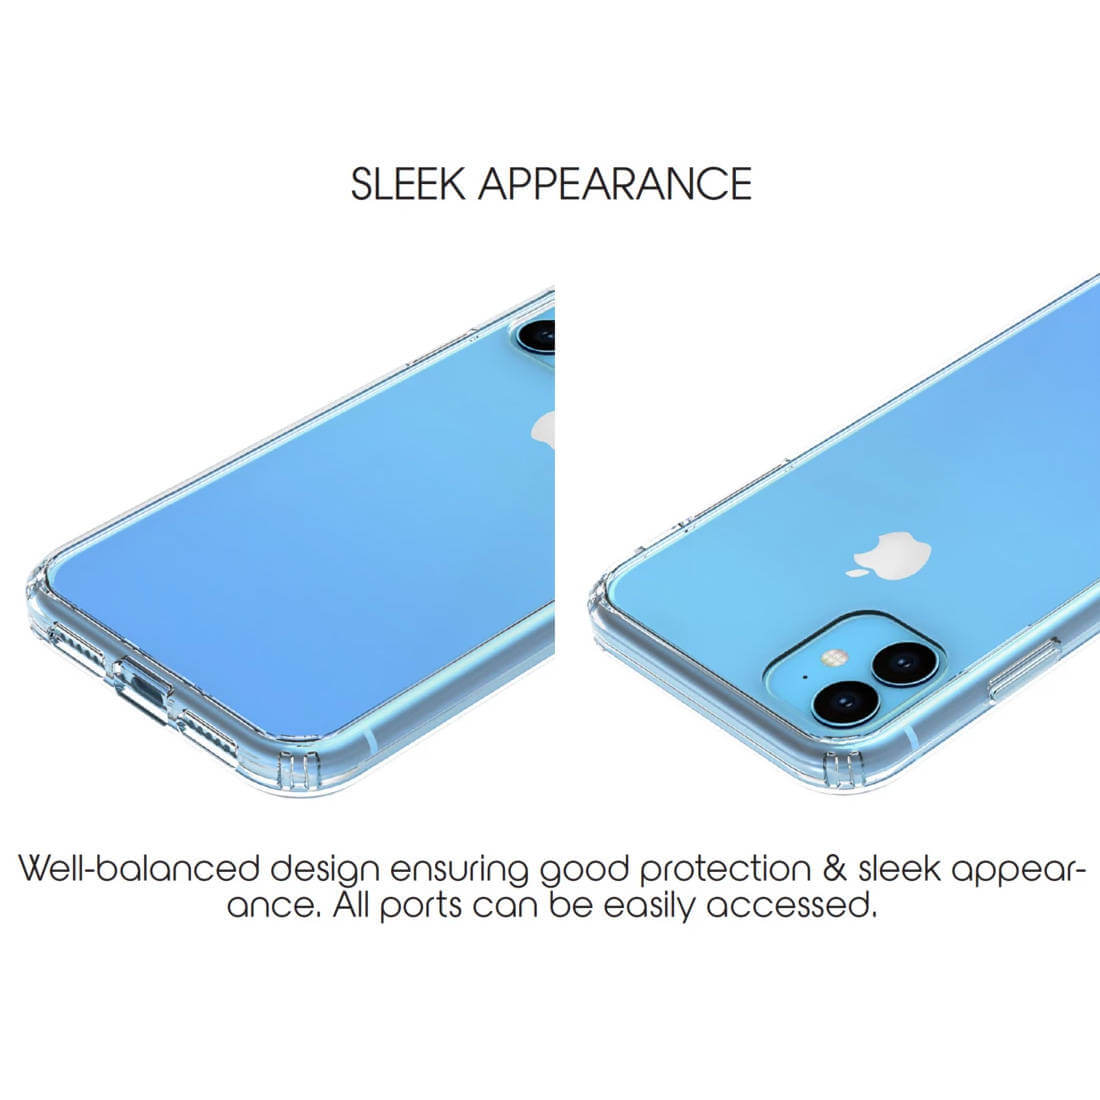 Bling My Thing Milky Way Pure Brilliance — хибриден удароустойчив кейс с кристали Cваровски за iPhone 11 Pro Max (прозрачен) - 2